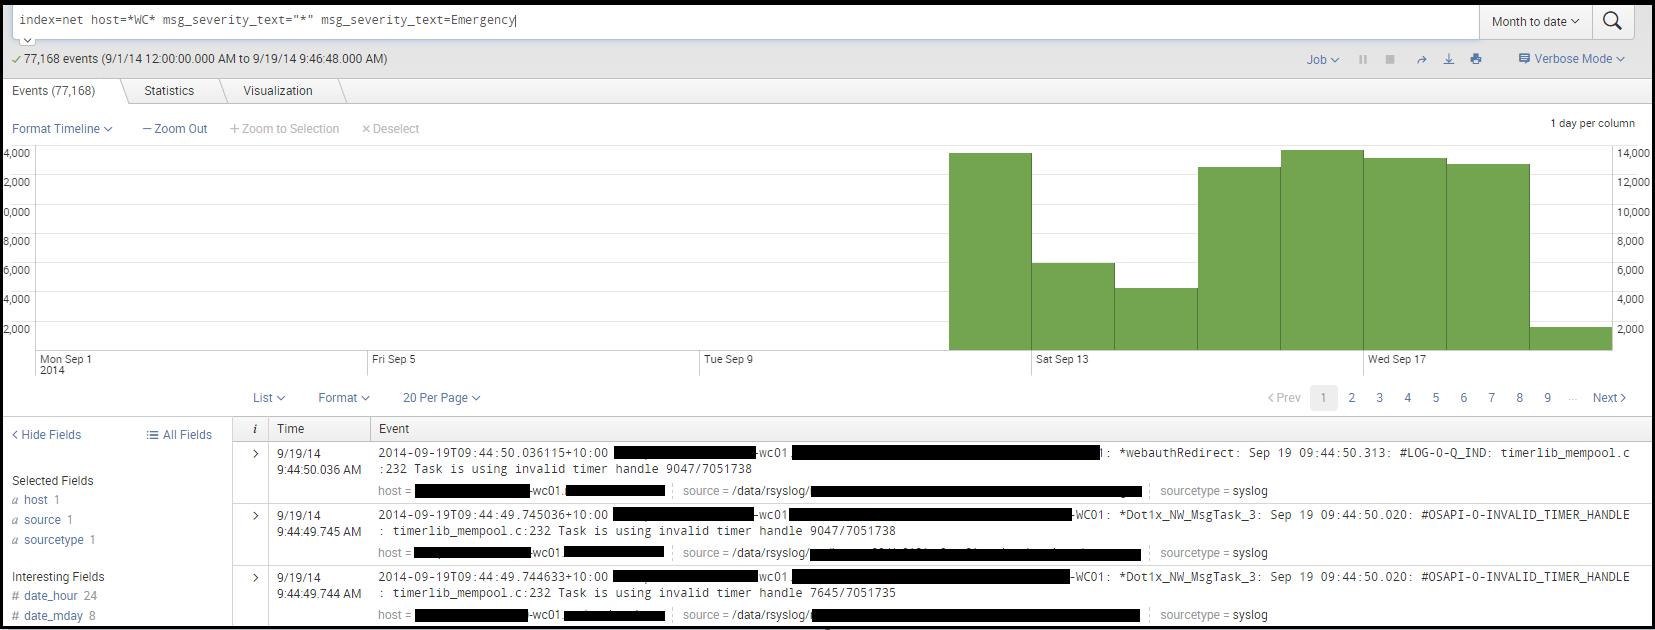 WLC Syslog Analysis | mrn-cciew